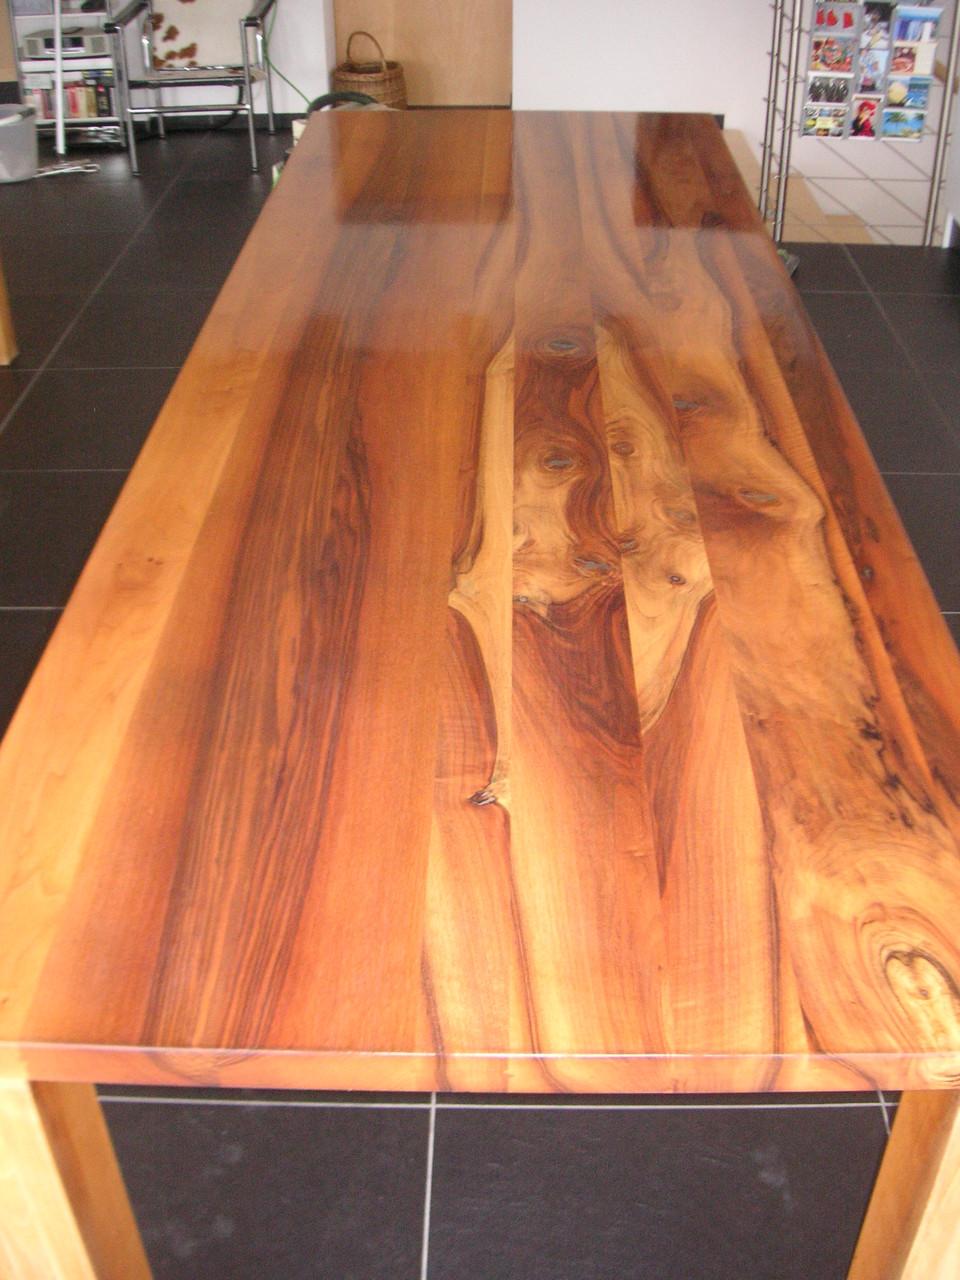 Massivholztisch frisch lackiert